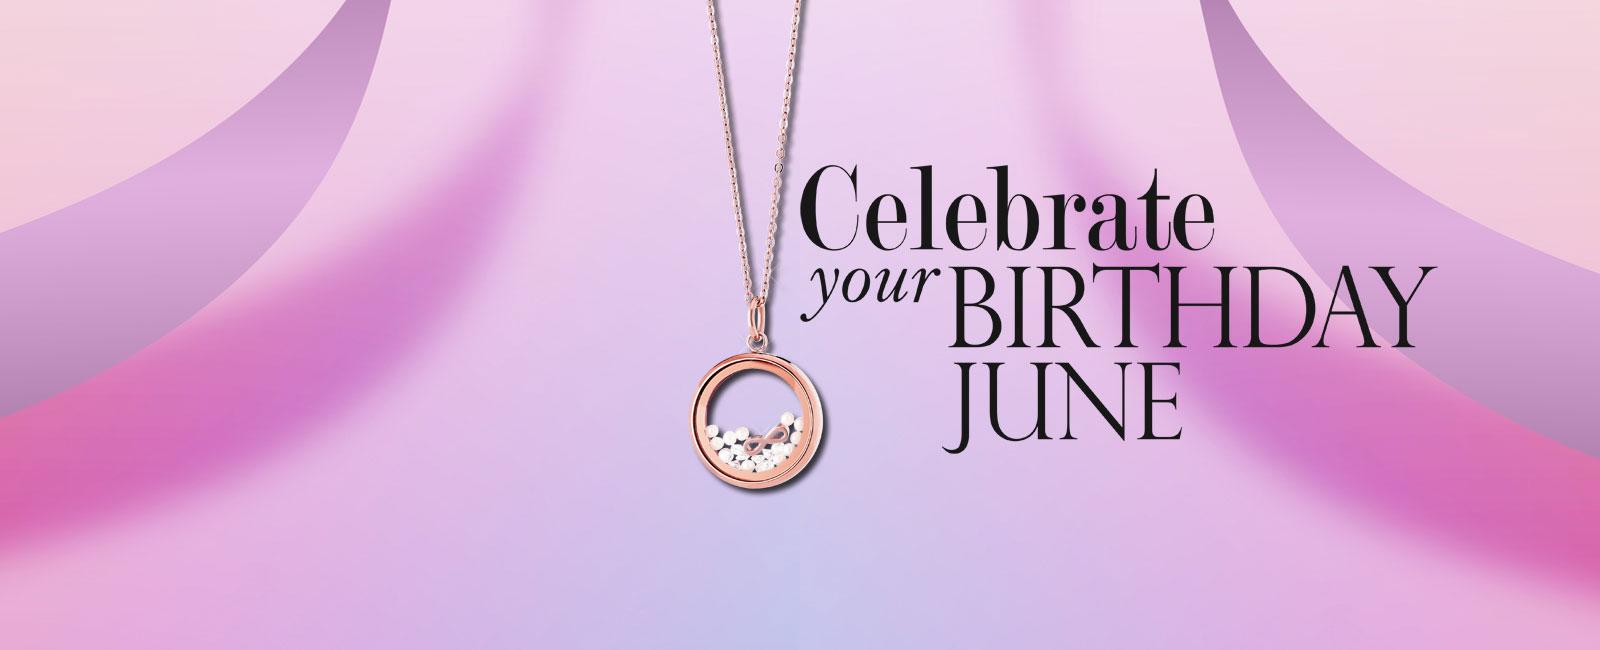 Celebrate your birthday - Lucky Birthstones - Loisir